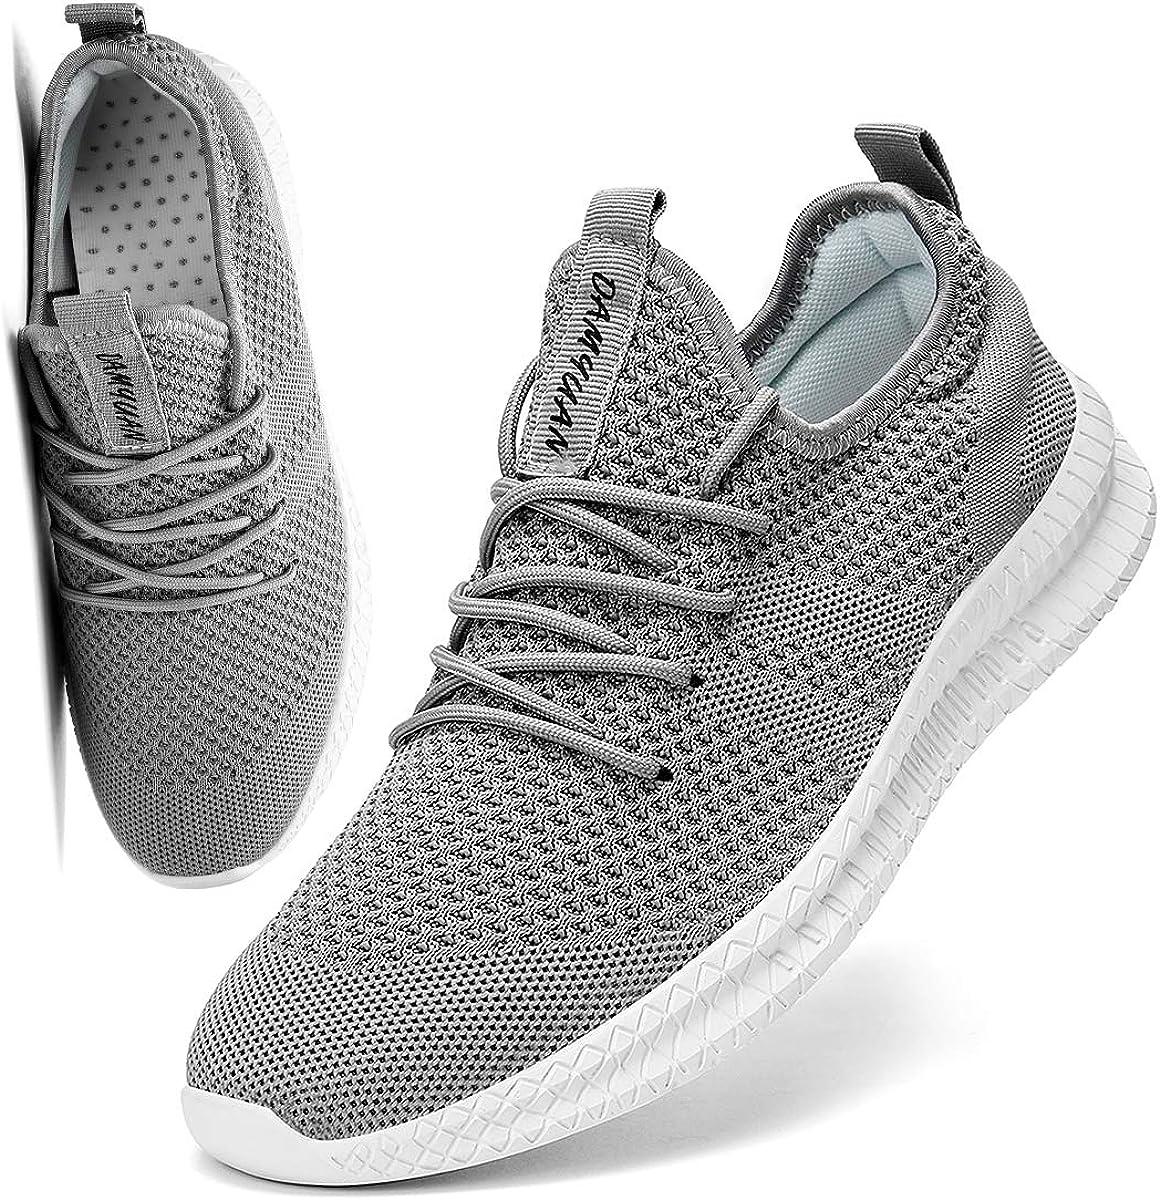 FUJEAK Men Running Shoes Spo favorite Breathable Walking Casual Max 53% OFF